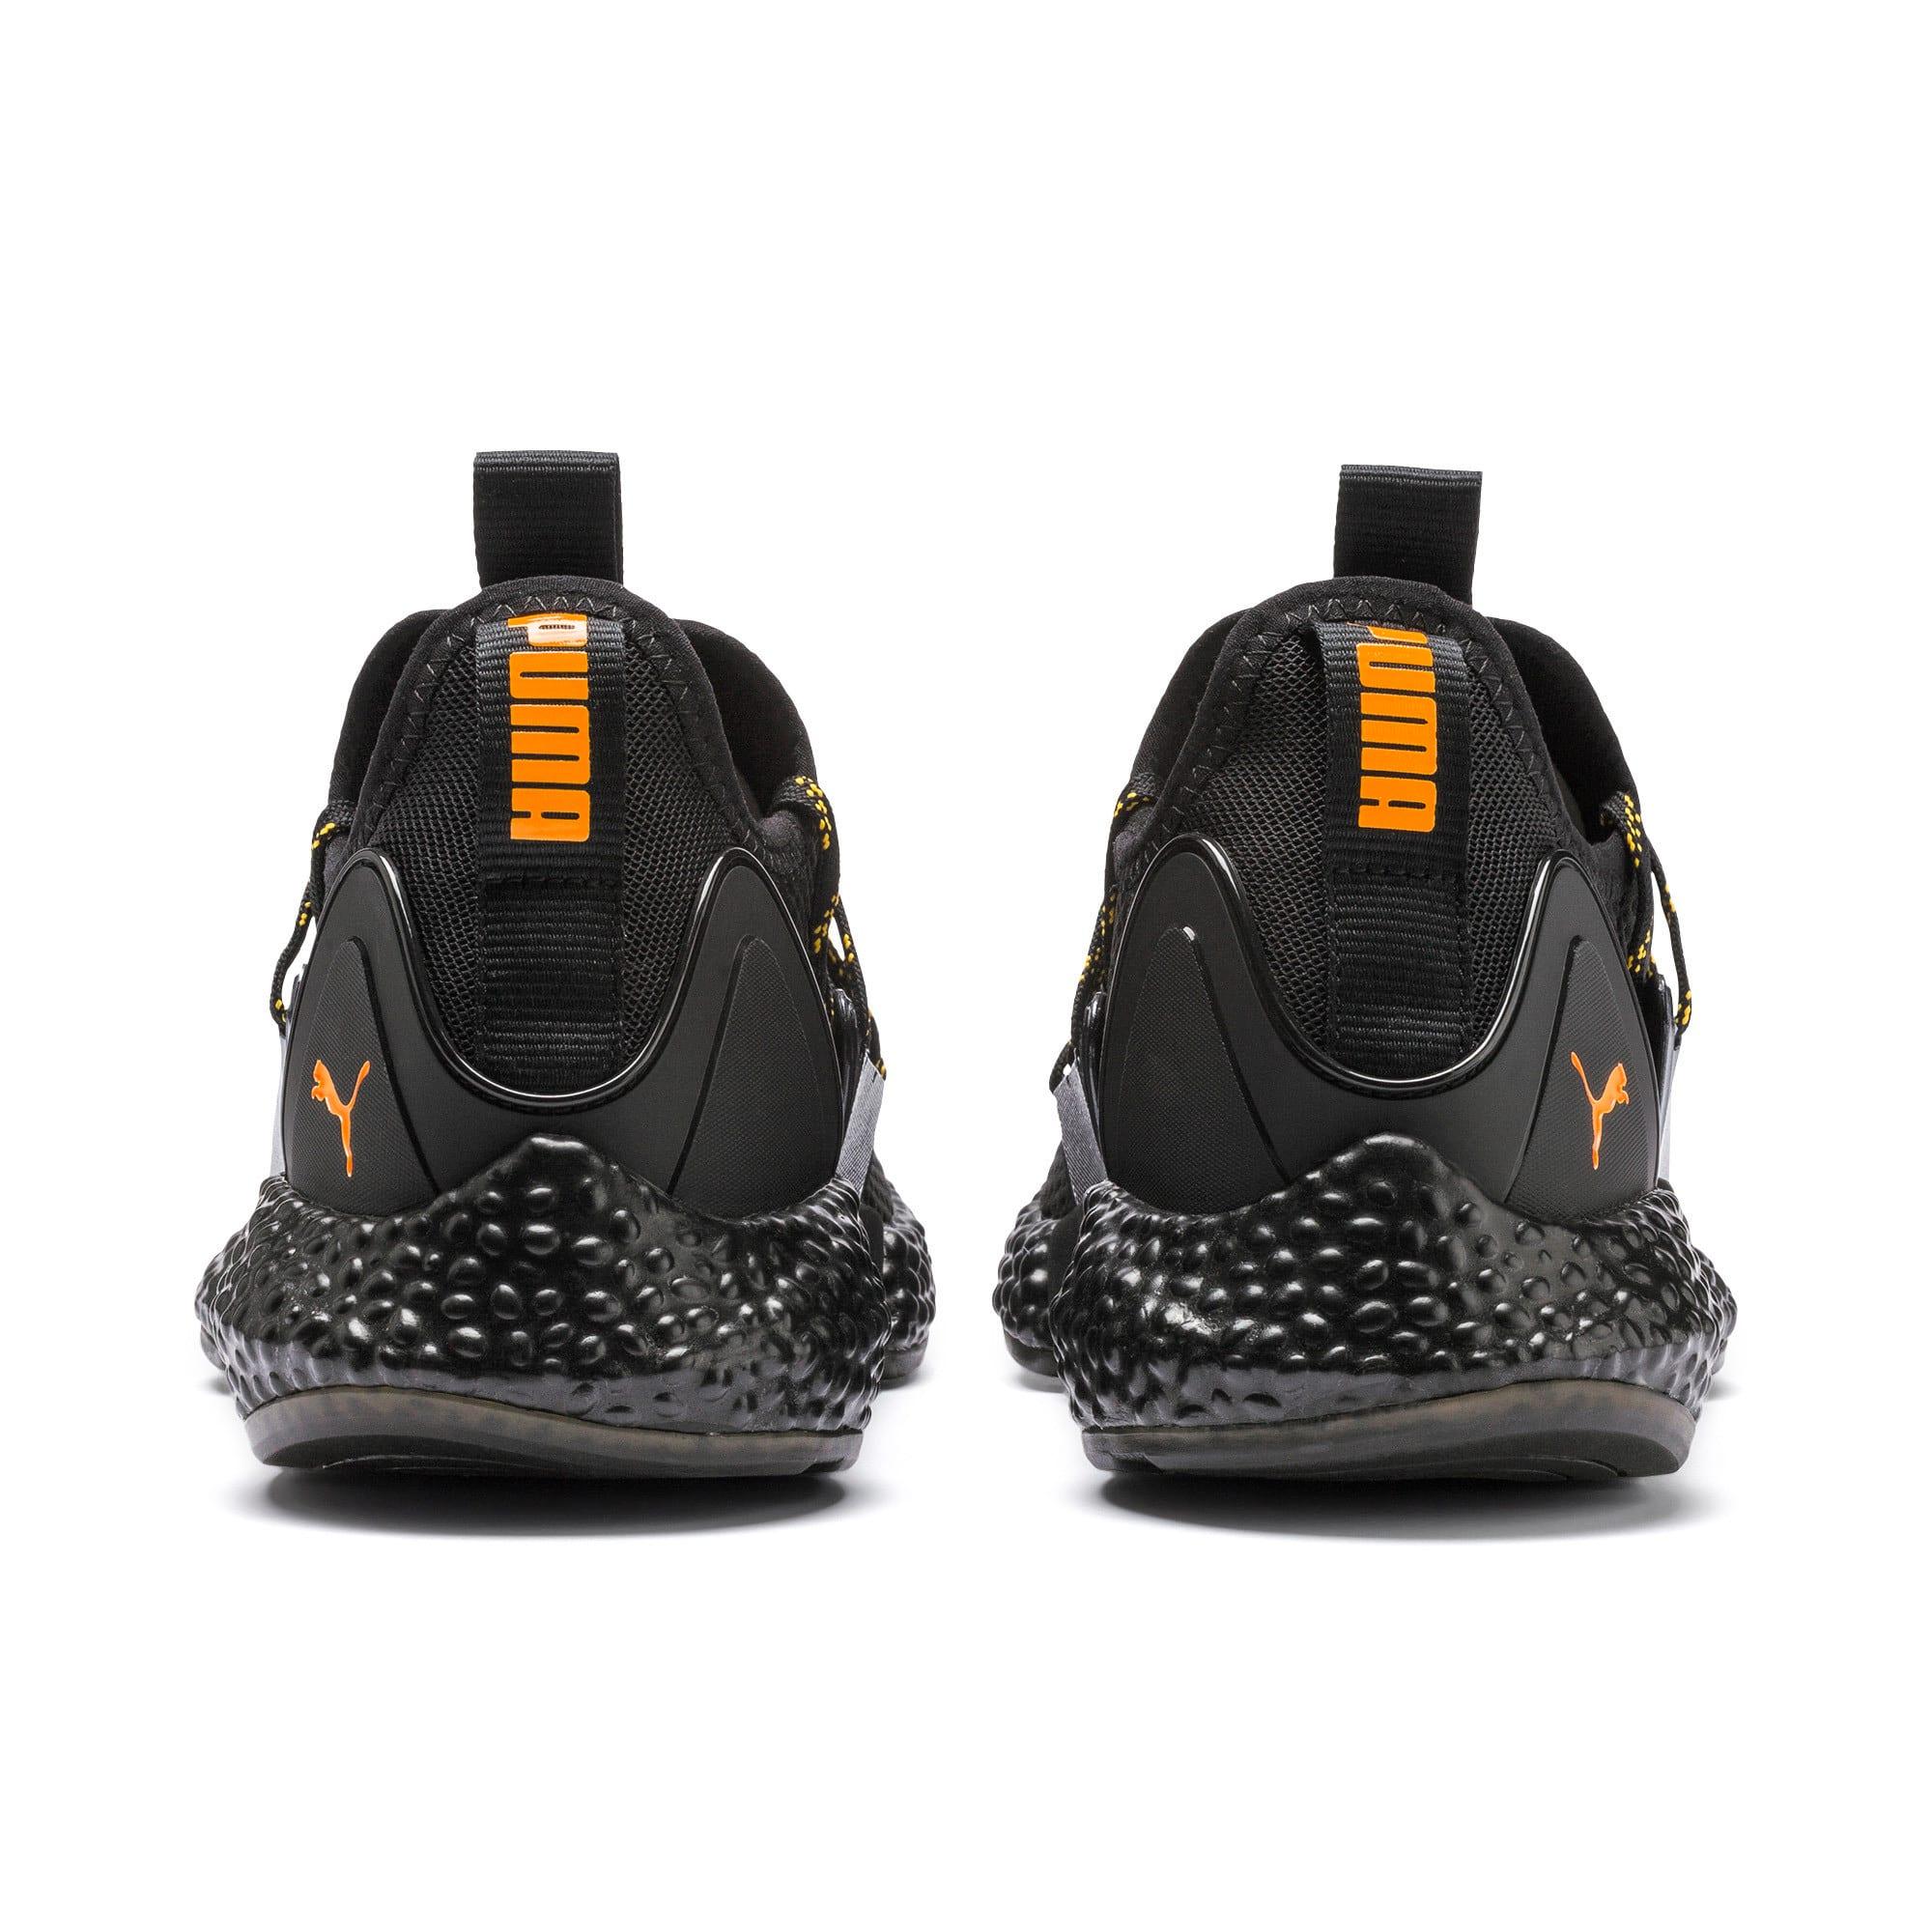 Thumbnail 4 of HYBRID Rocket Aero Men's Running Shoes, Puma Black-Puma Black, medium